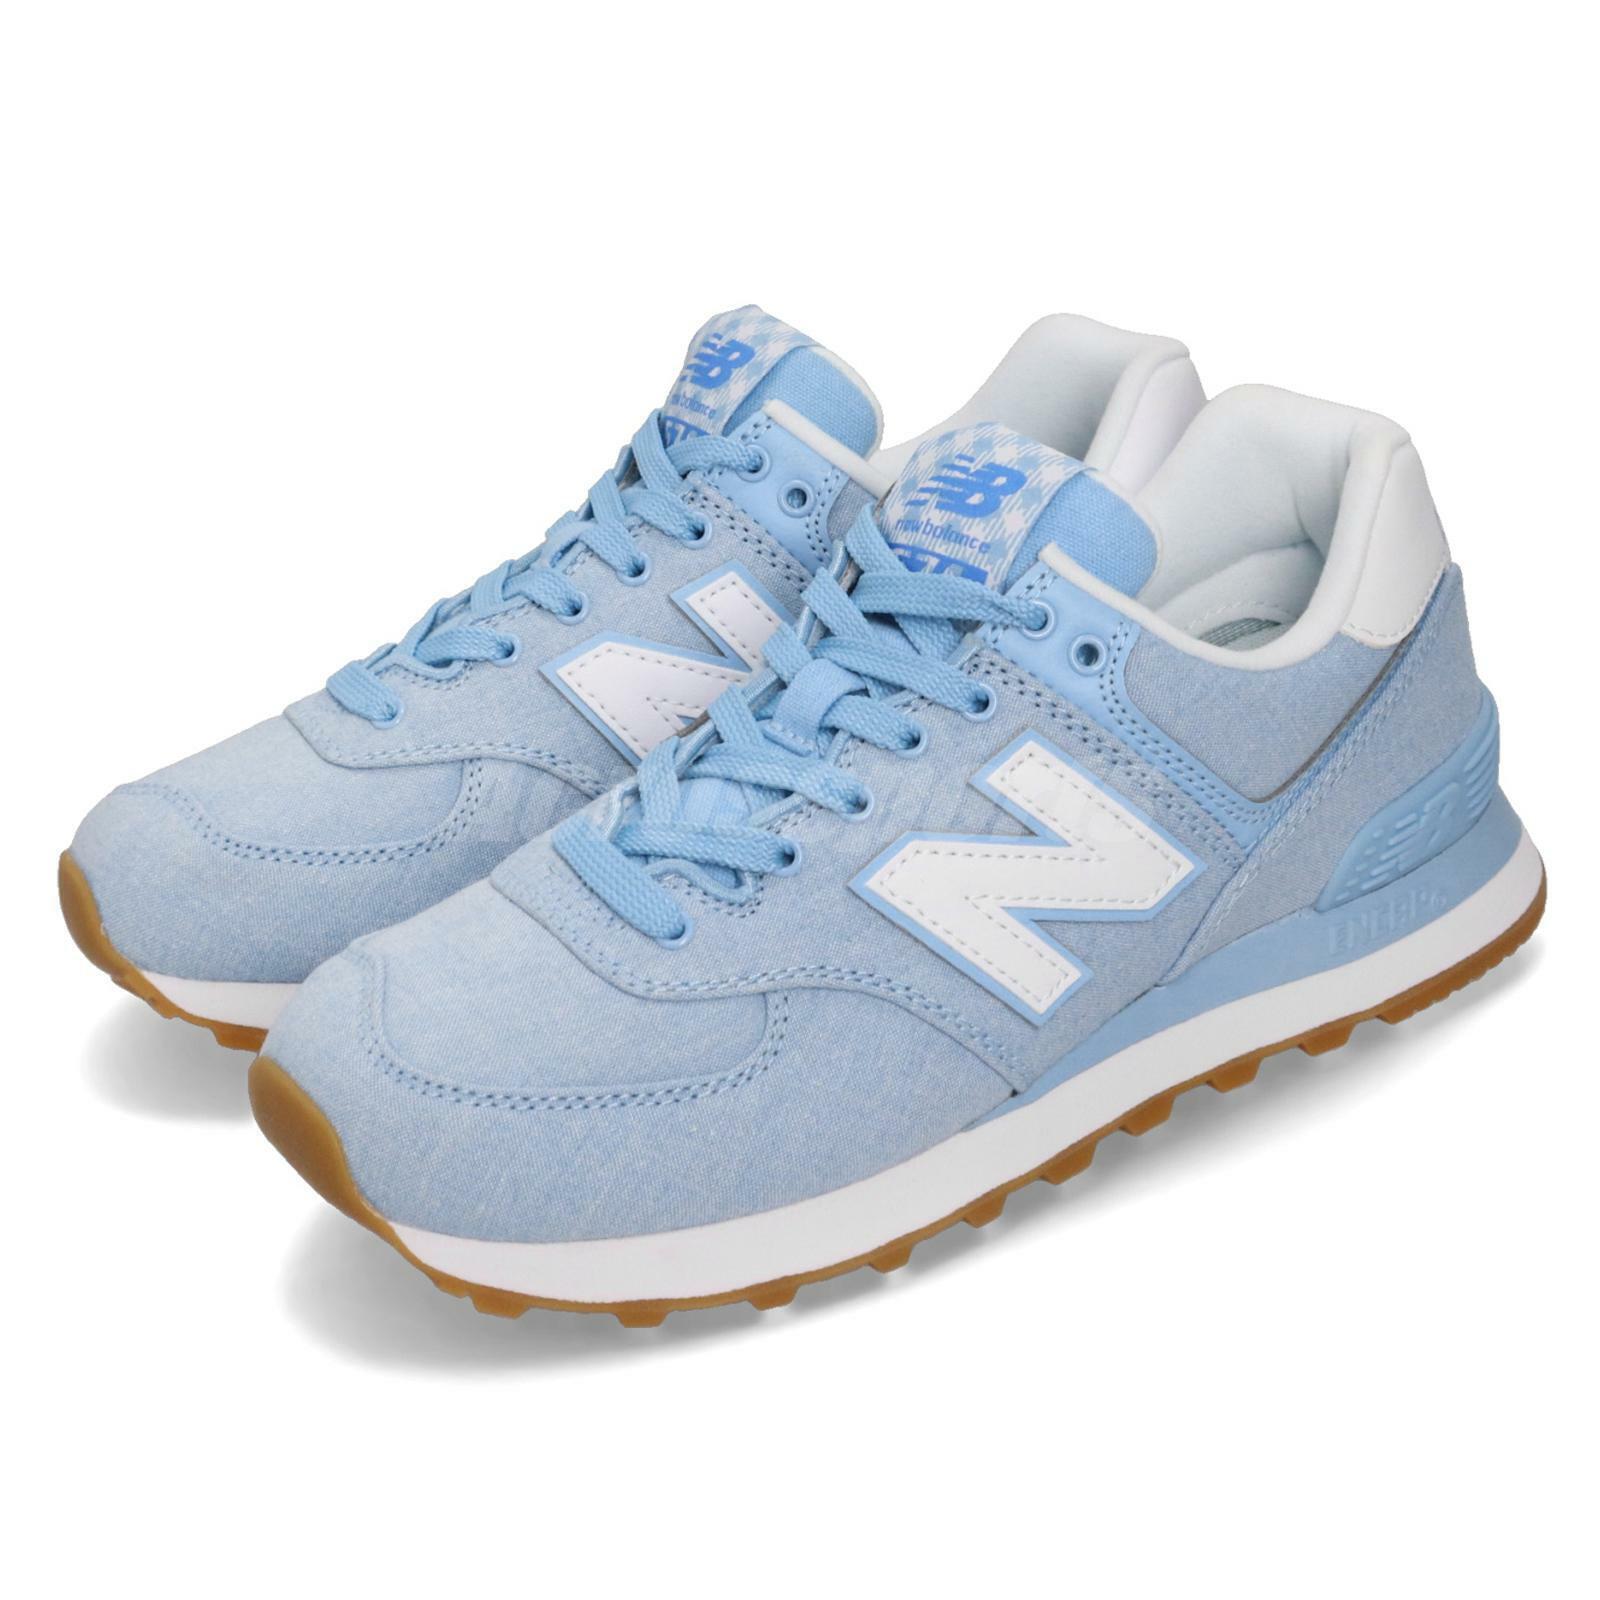 New balance WL574SKB B azul blancoo goma de masCoche Mujer Running Zapatos TENIS WL 574 skbb